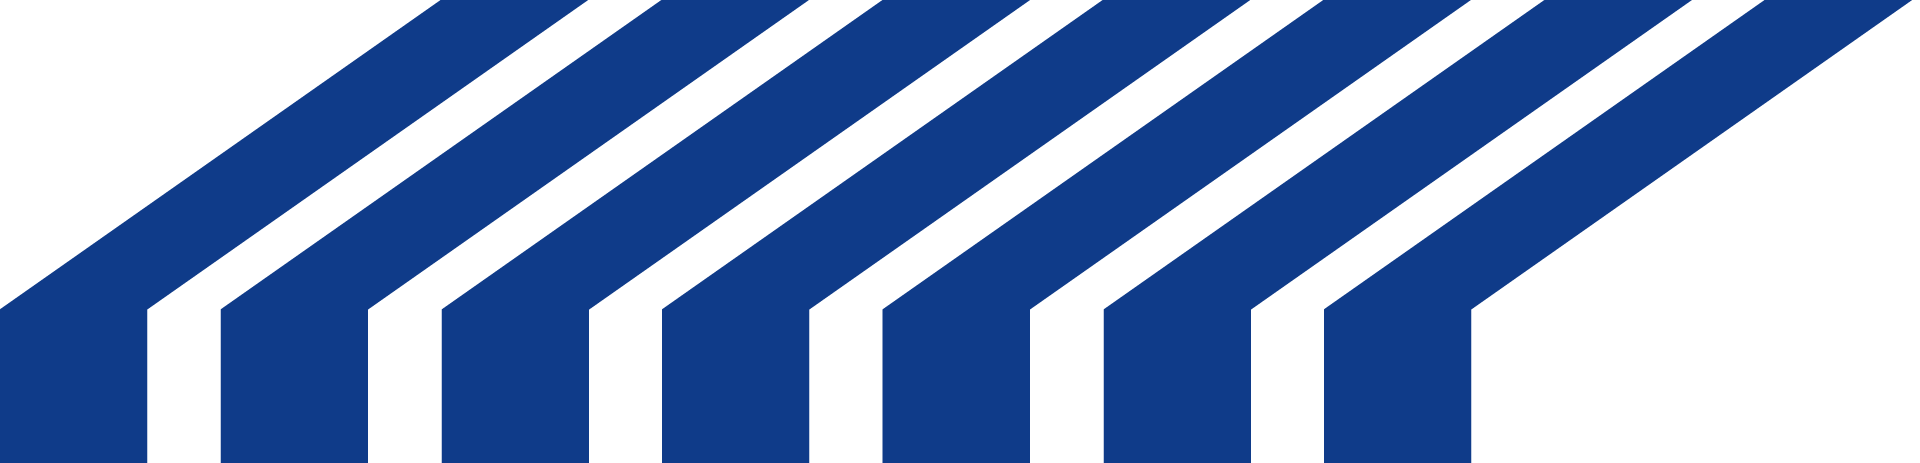 Vettiger Titelsektion Logo